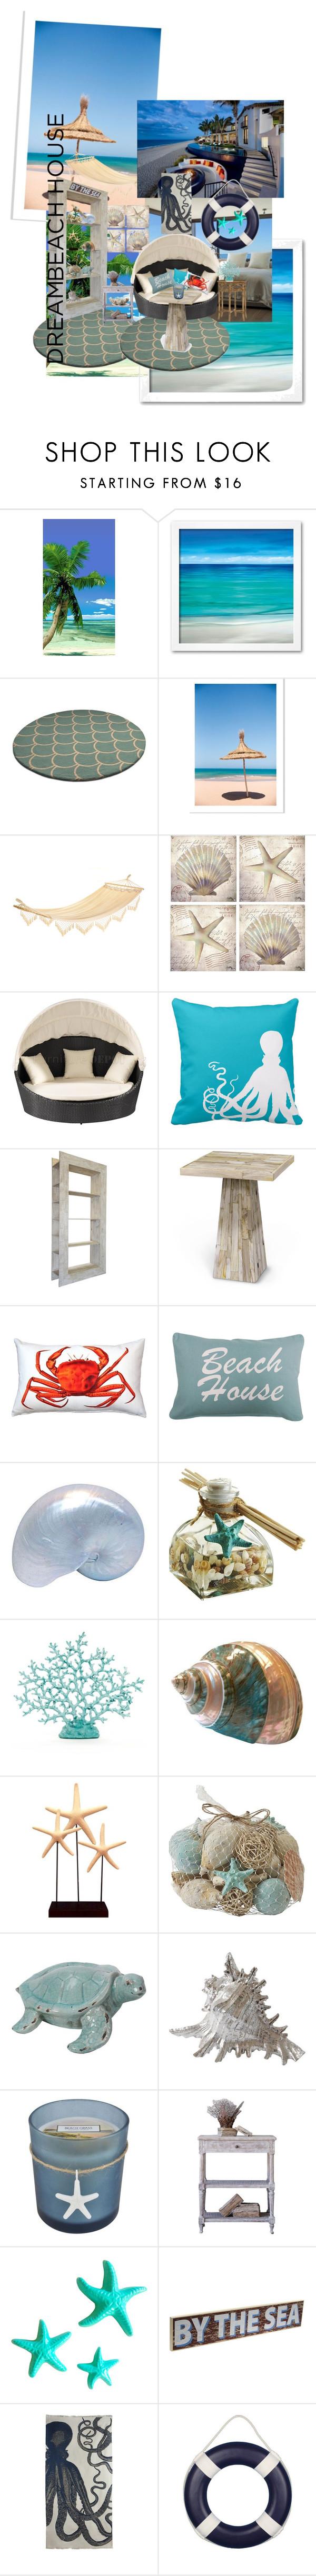 """beach house"" by alaina-dixon on Polyvore featuring interior, interiors, interior design, home, home decor, interior decorating, Dot & Bo, Thirstystone, Pillow Decor and Park B. Smith"